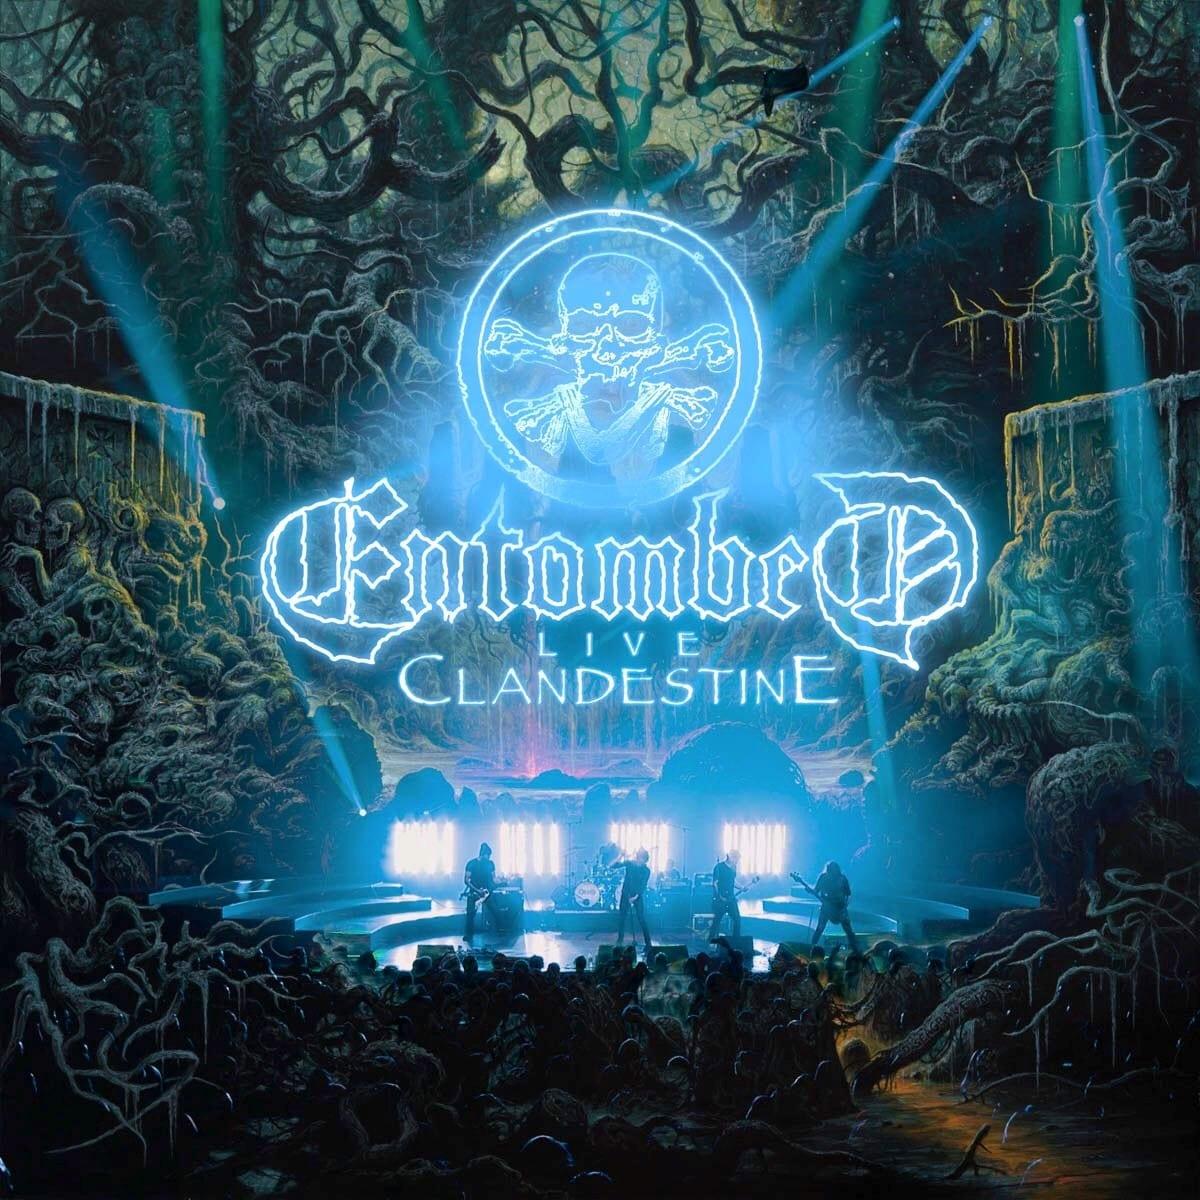 Entombed - Live Clandestine.jpg